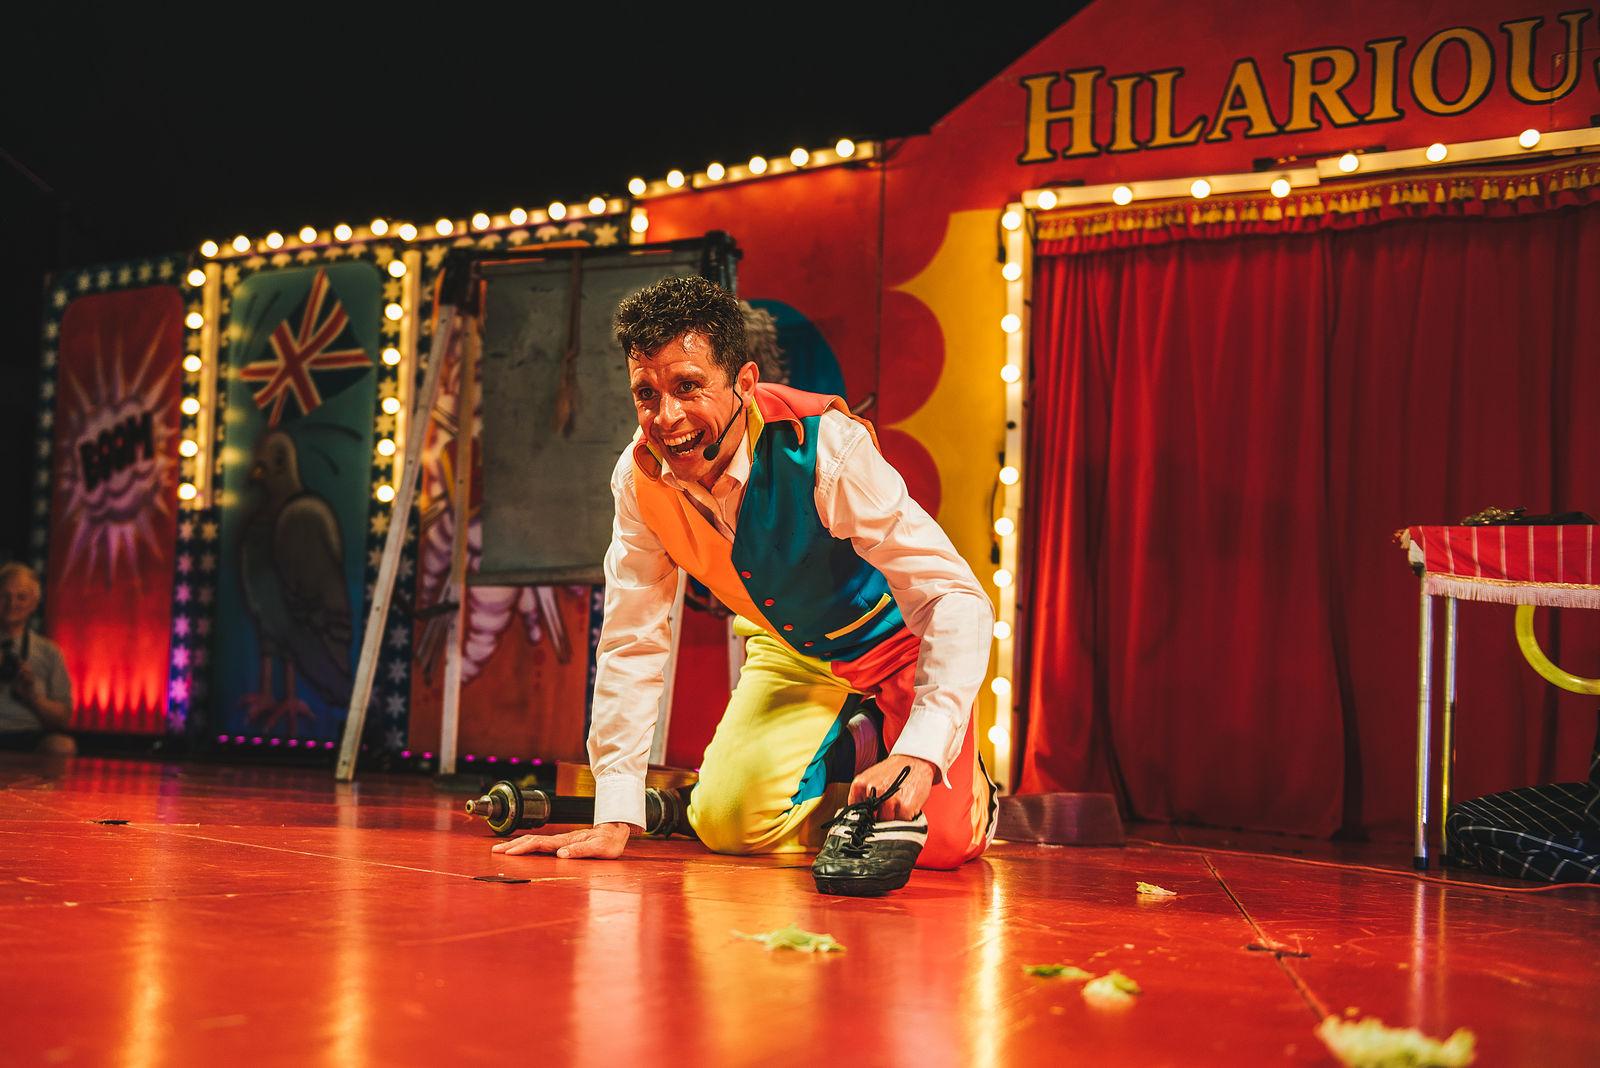 Cirque Du Hilarious